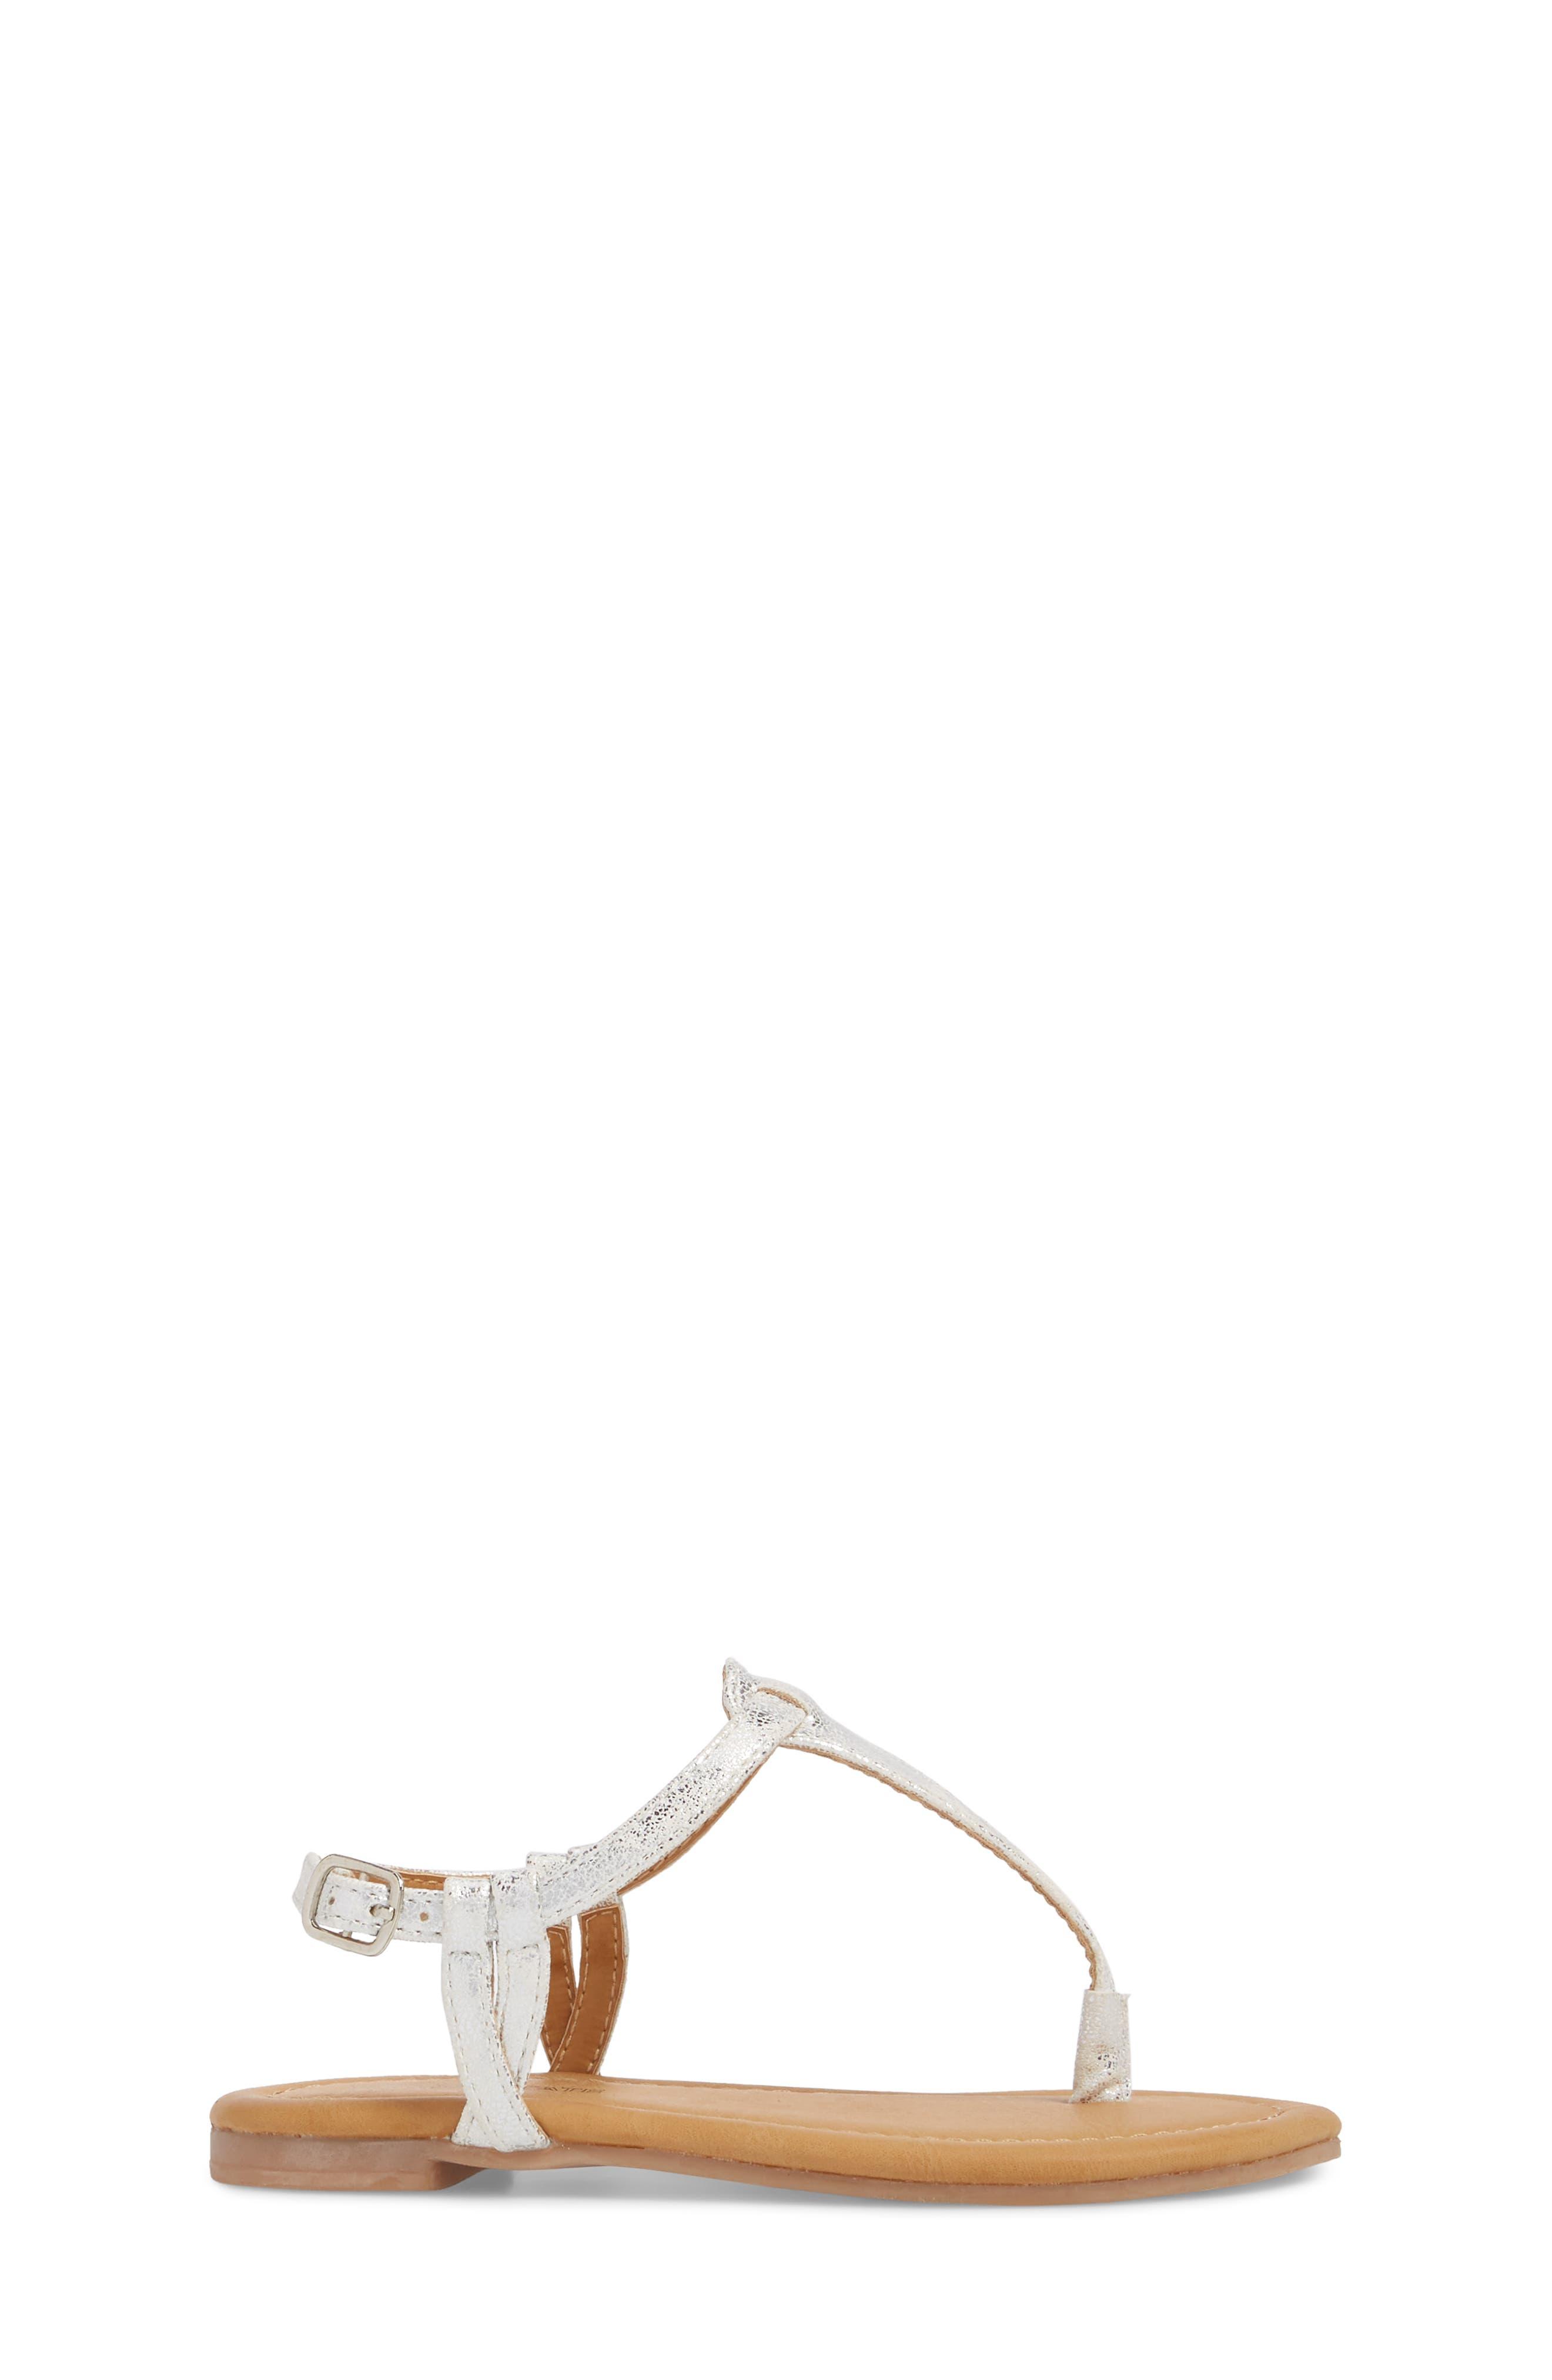 Lizzie Sandal,                             Alternate thumbnail 3, color,                             White/ Silver Faux Leather